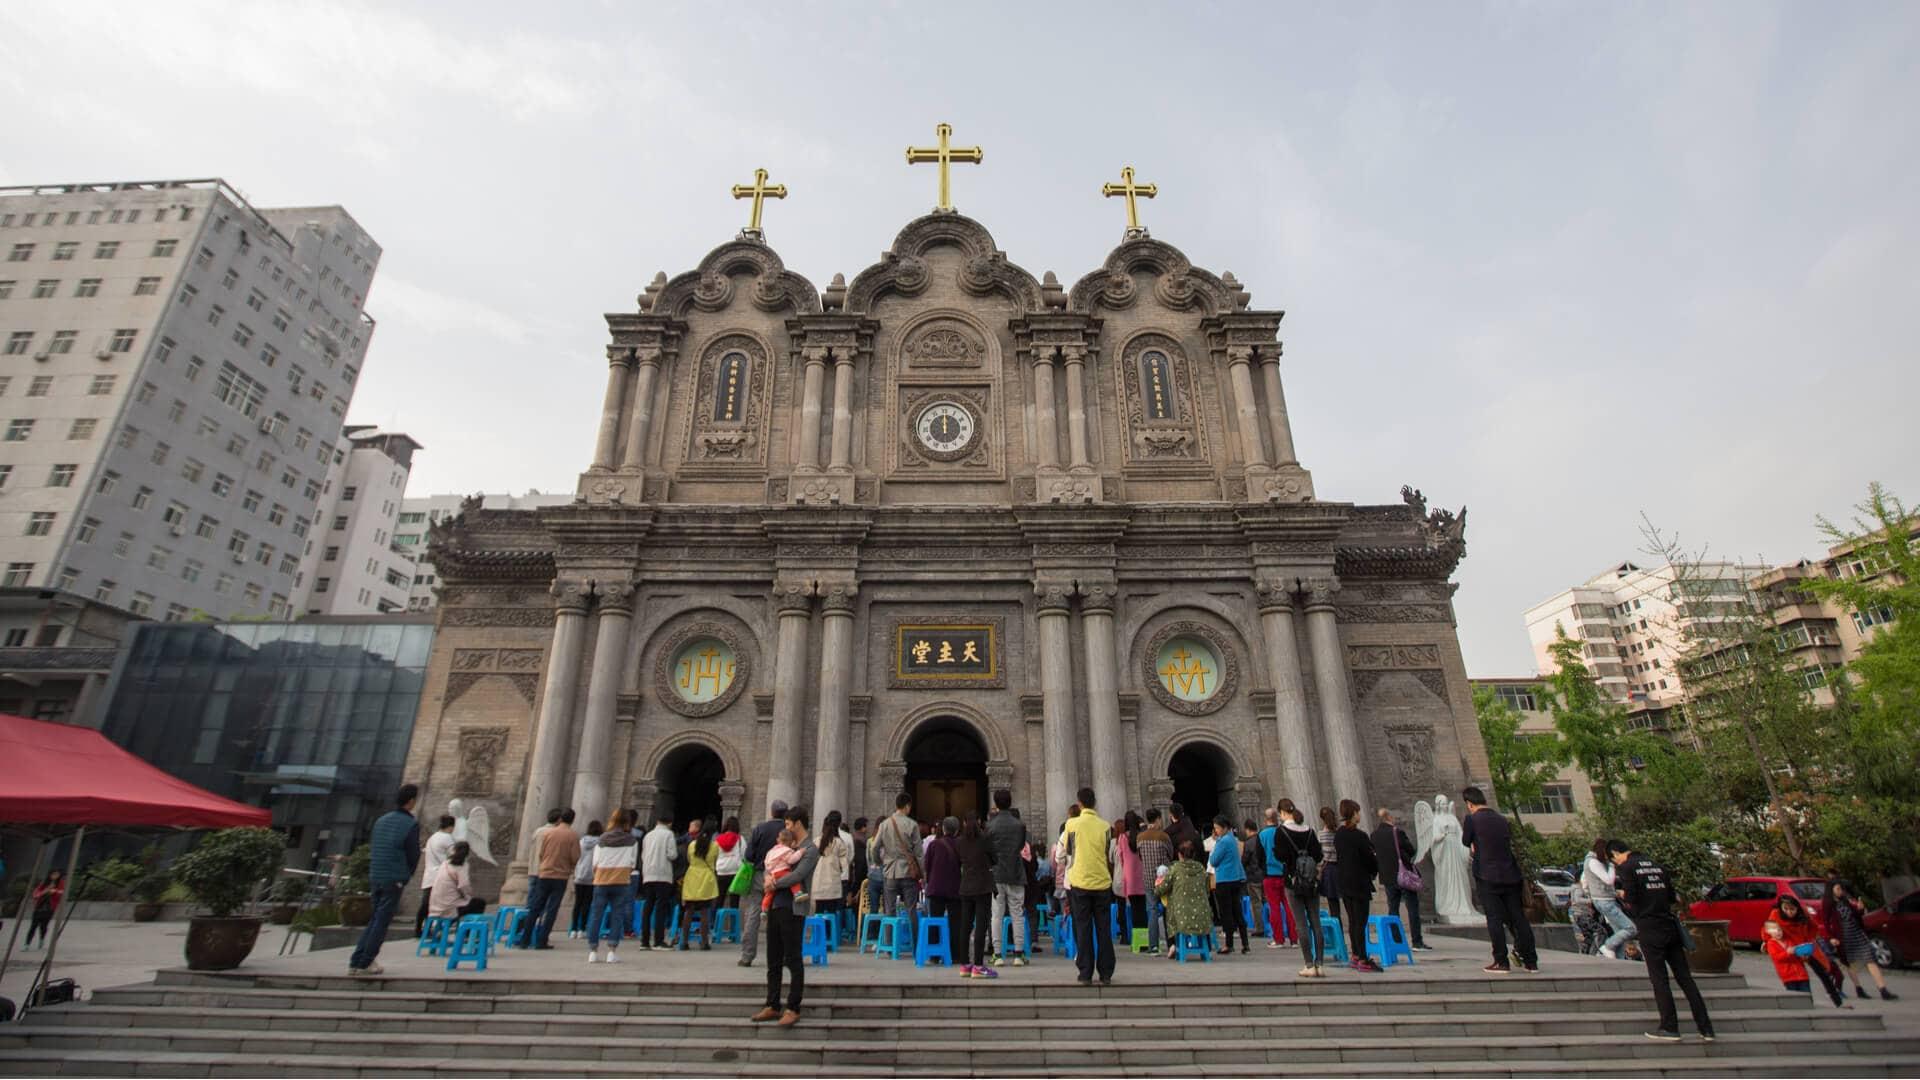 Igreja%20Cat%C3%B3lica%20em%20Xian%2C%20China%20